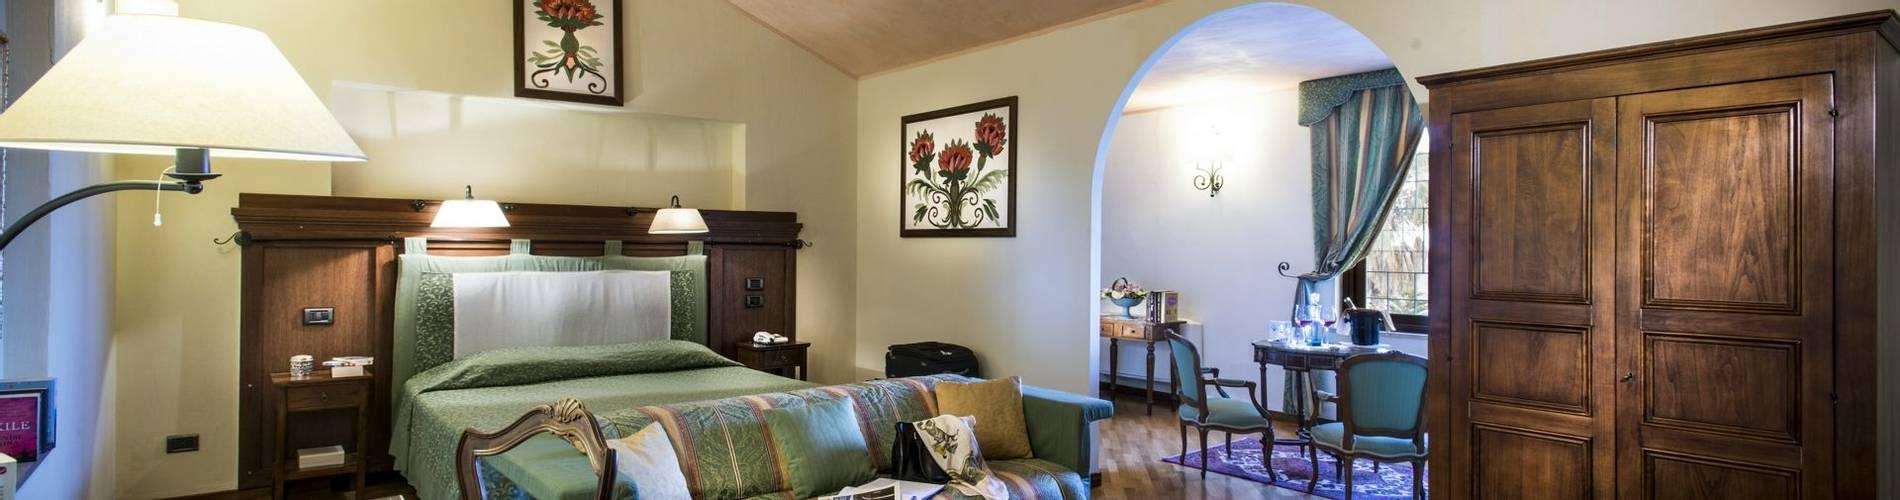 Santa Anastasia, Sicily, Italy, Junior Suite.jpg